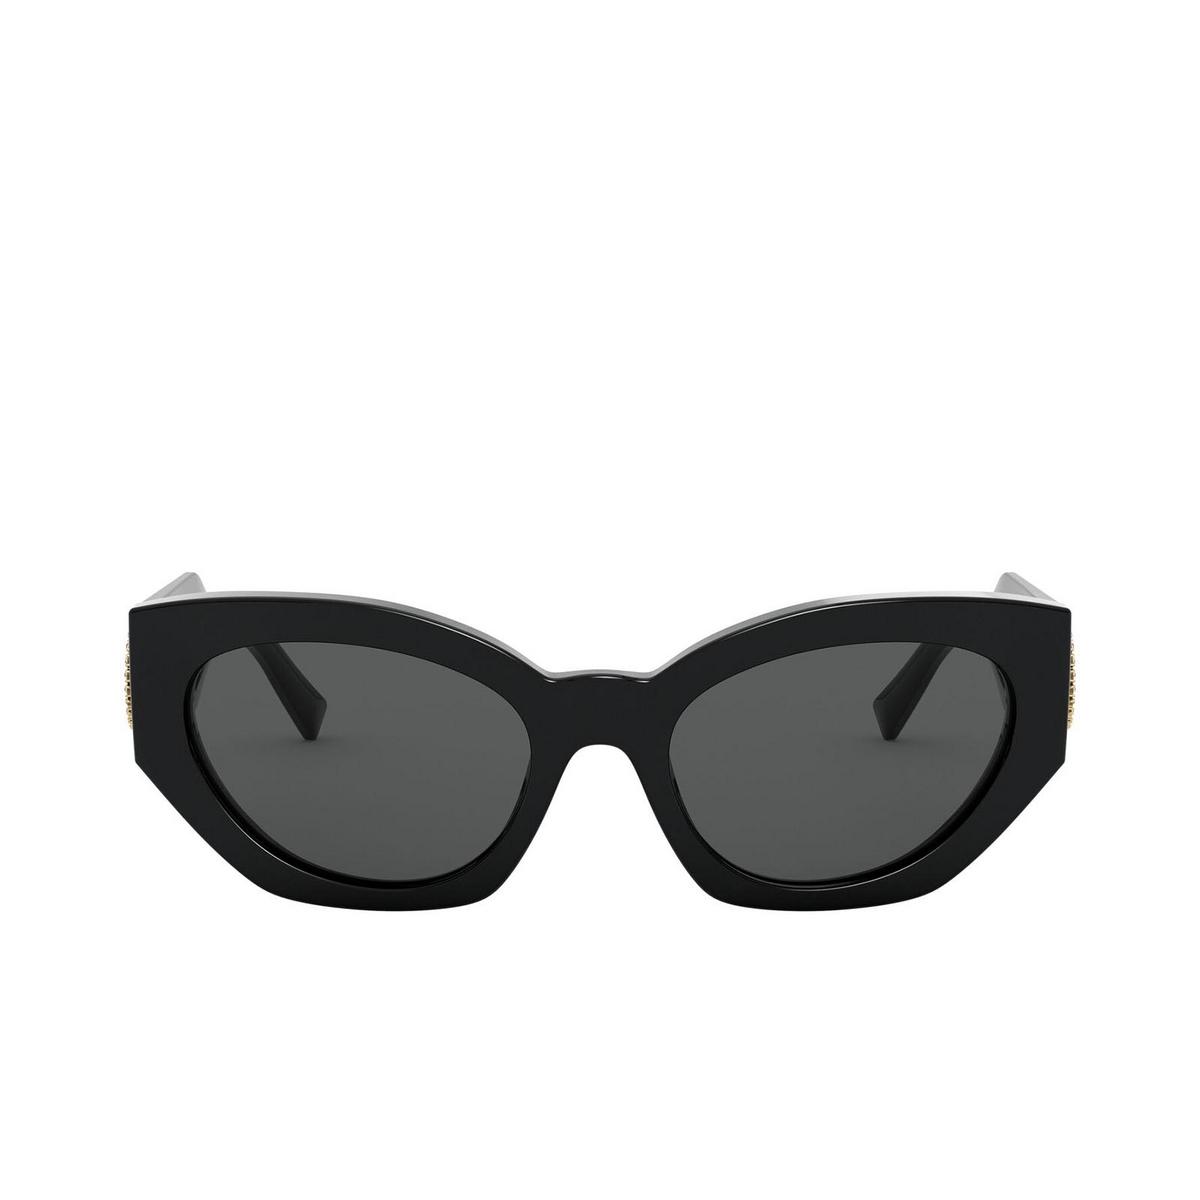 Versace® Irregular Sunglasses: VE4376B color Black GB1/87.